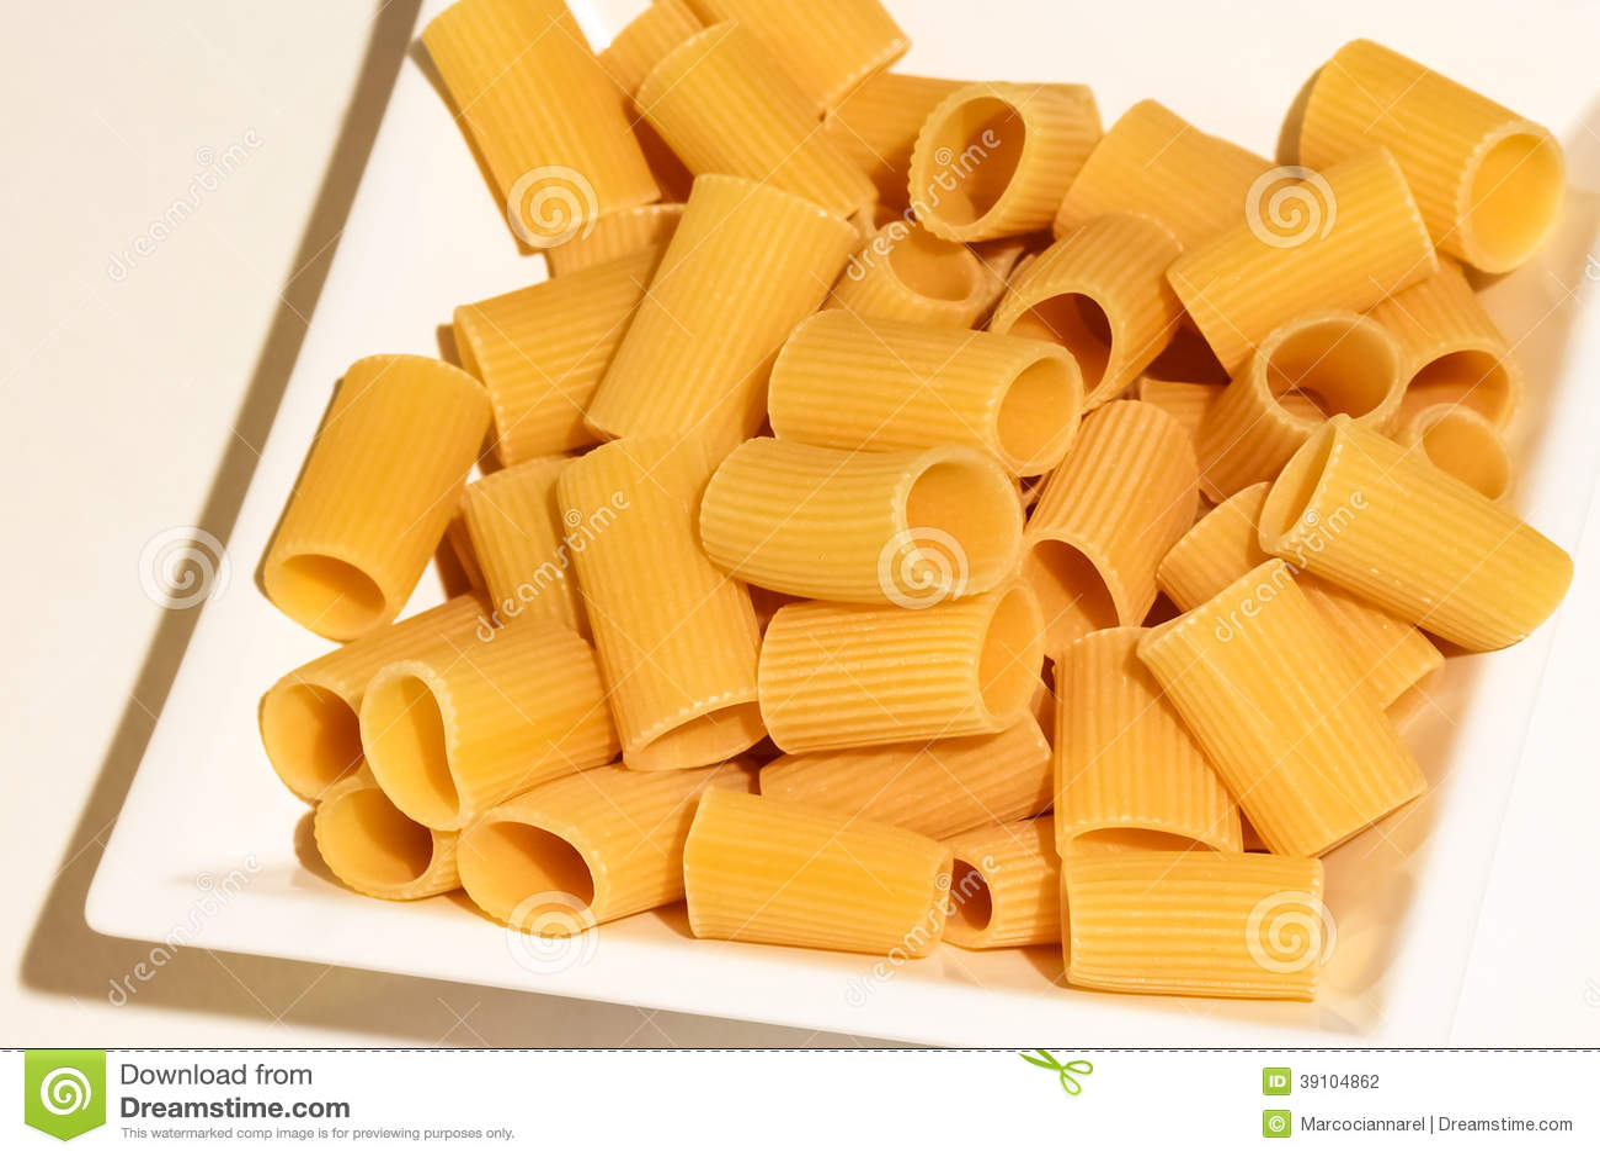 Macaronideegwaren